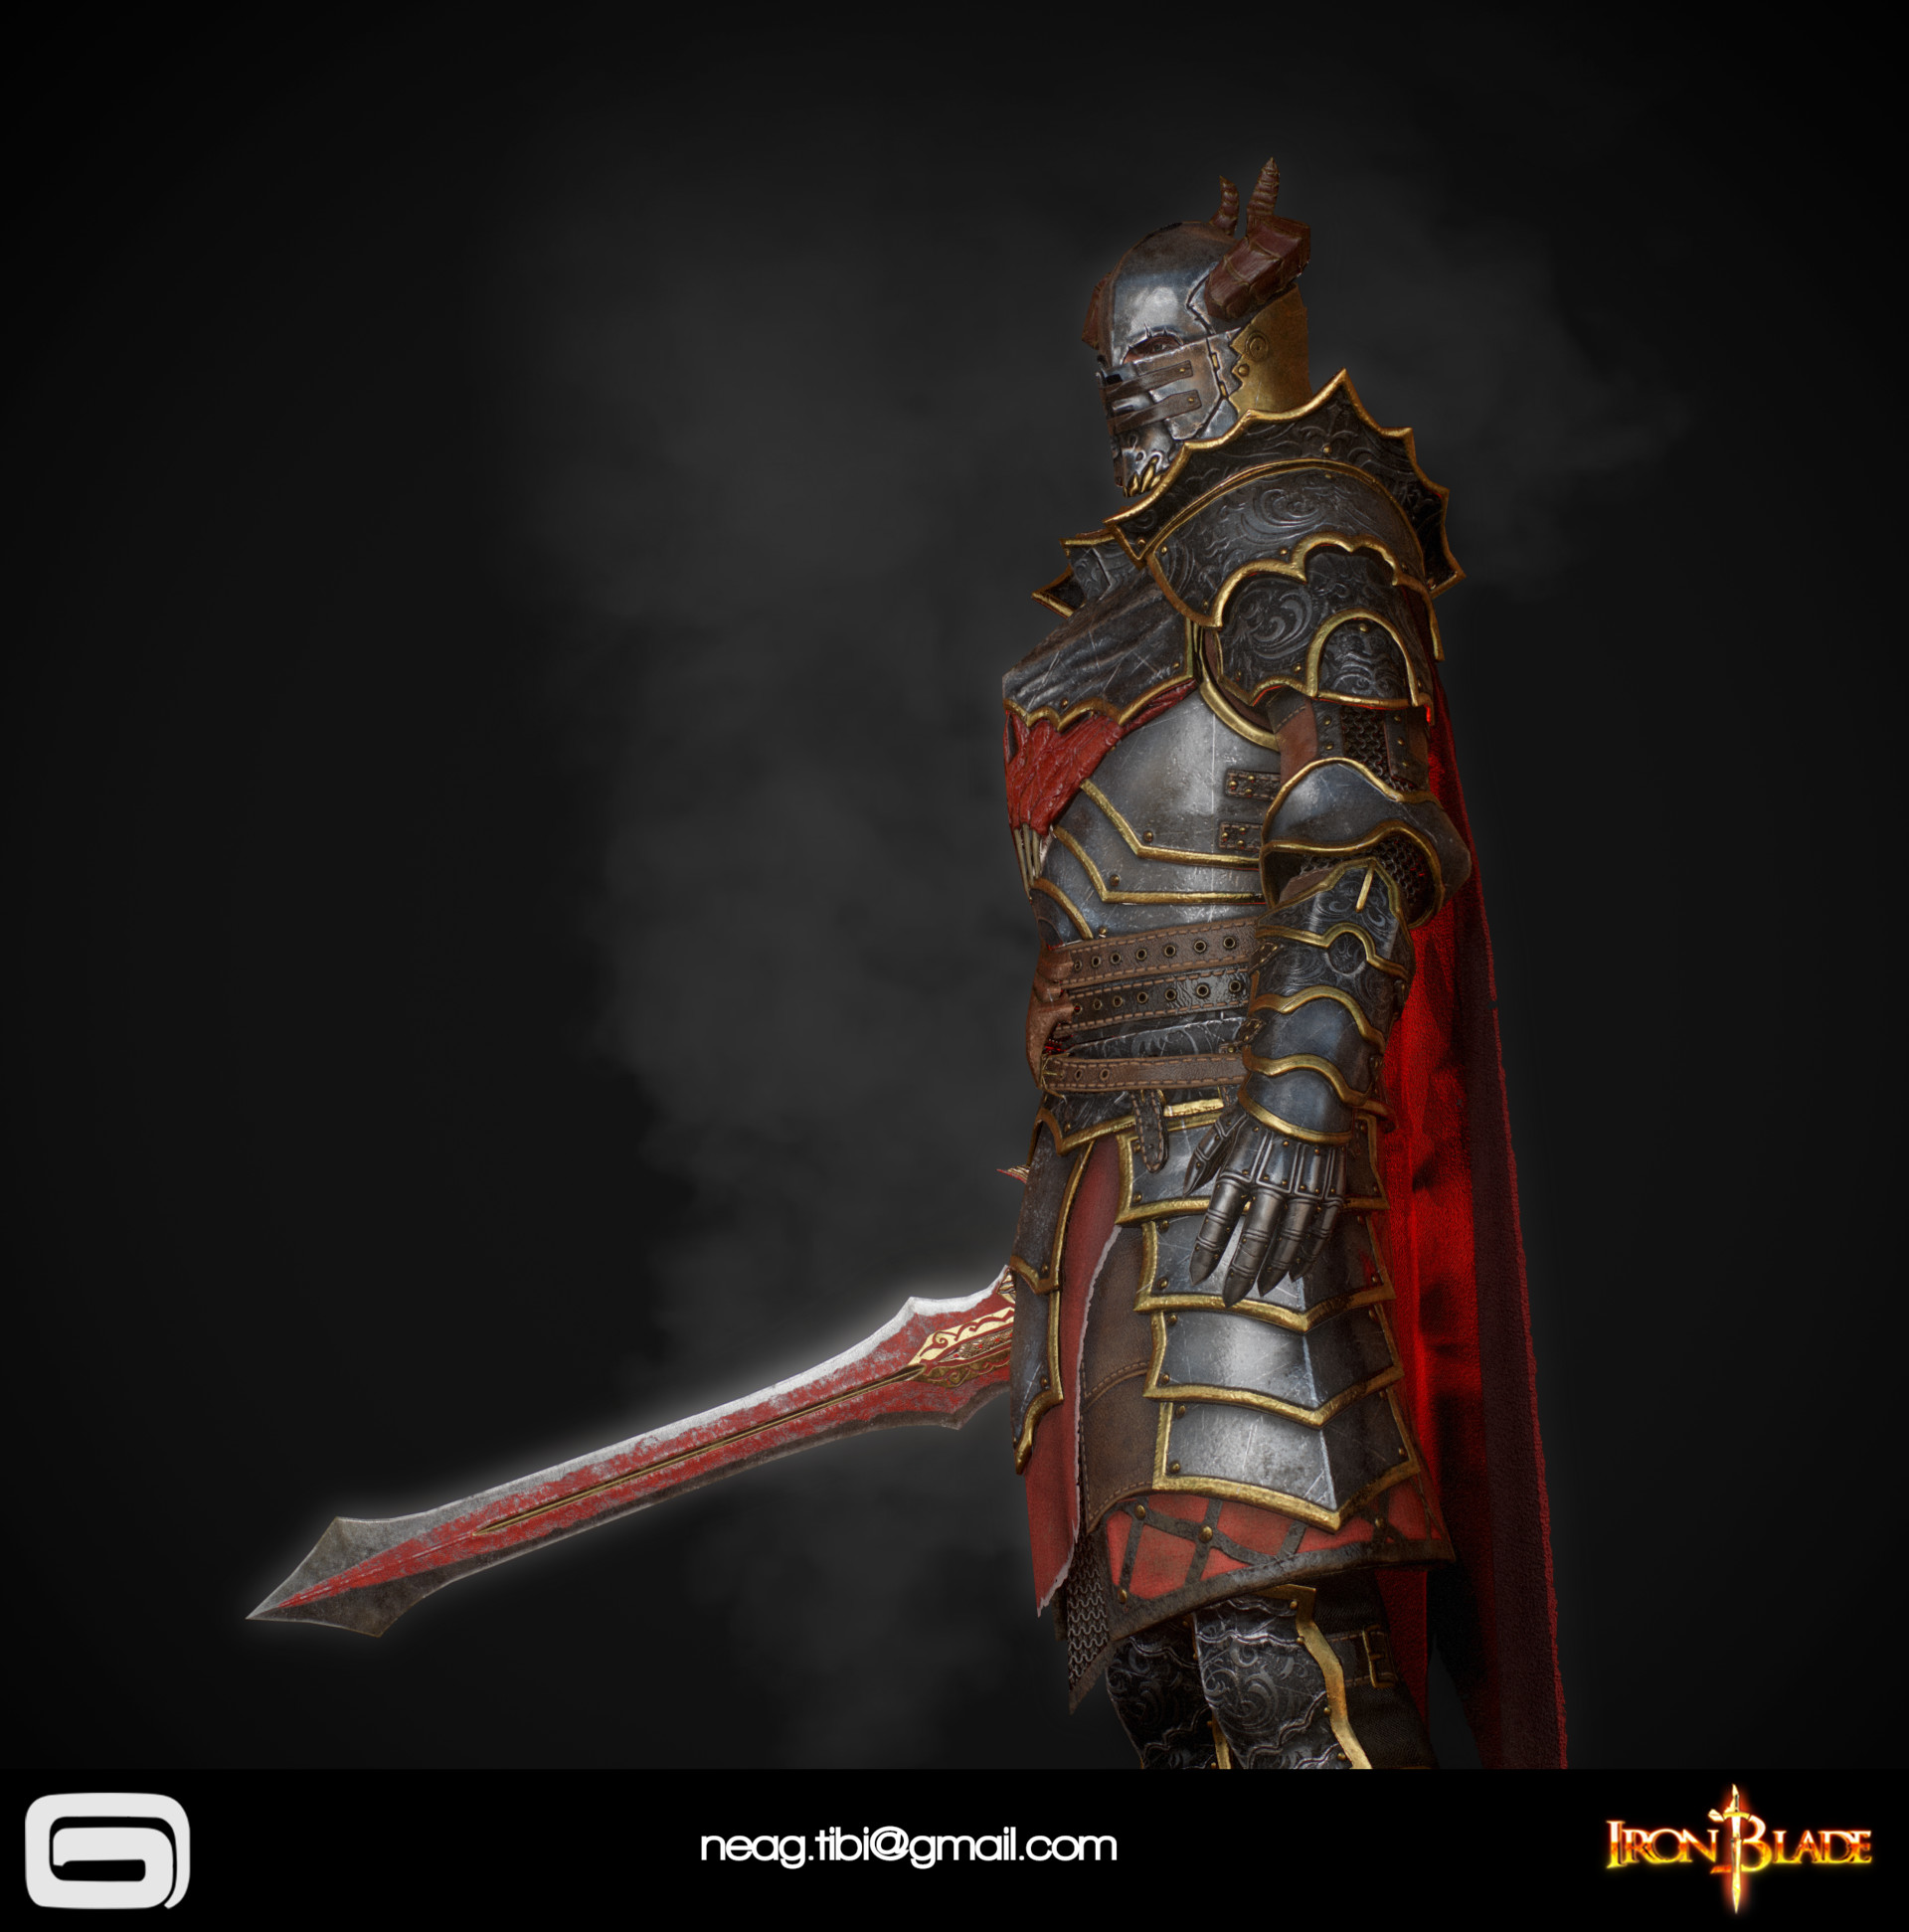 Tibi neag tibi neag iron blade mc armor 10c low poly 10